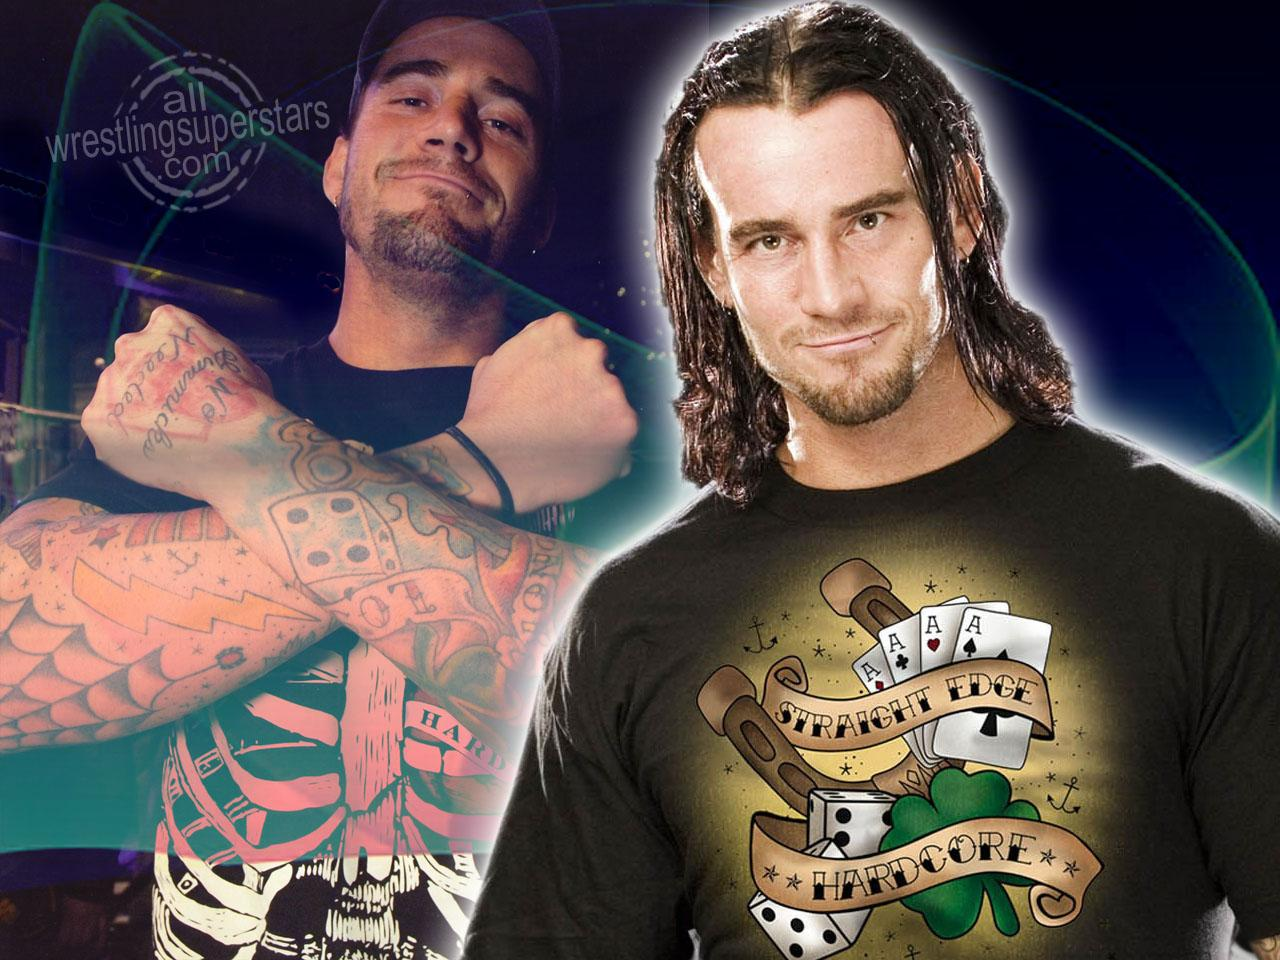 http://2.bp.blogspot.com/-M29s0raEPdw/Tiedn9_lyTI/AAAAAAAAE0A/kgr4QLg8-ug/s1600/WWE-WALLPAPERS-C-M-PUNK-2.JPG